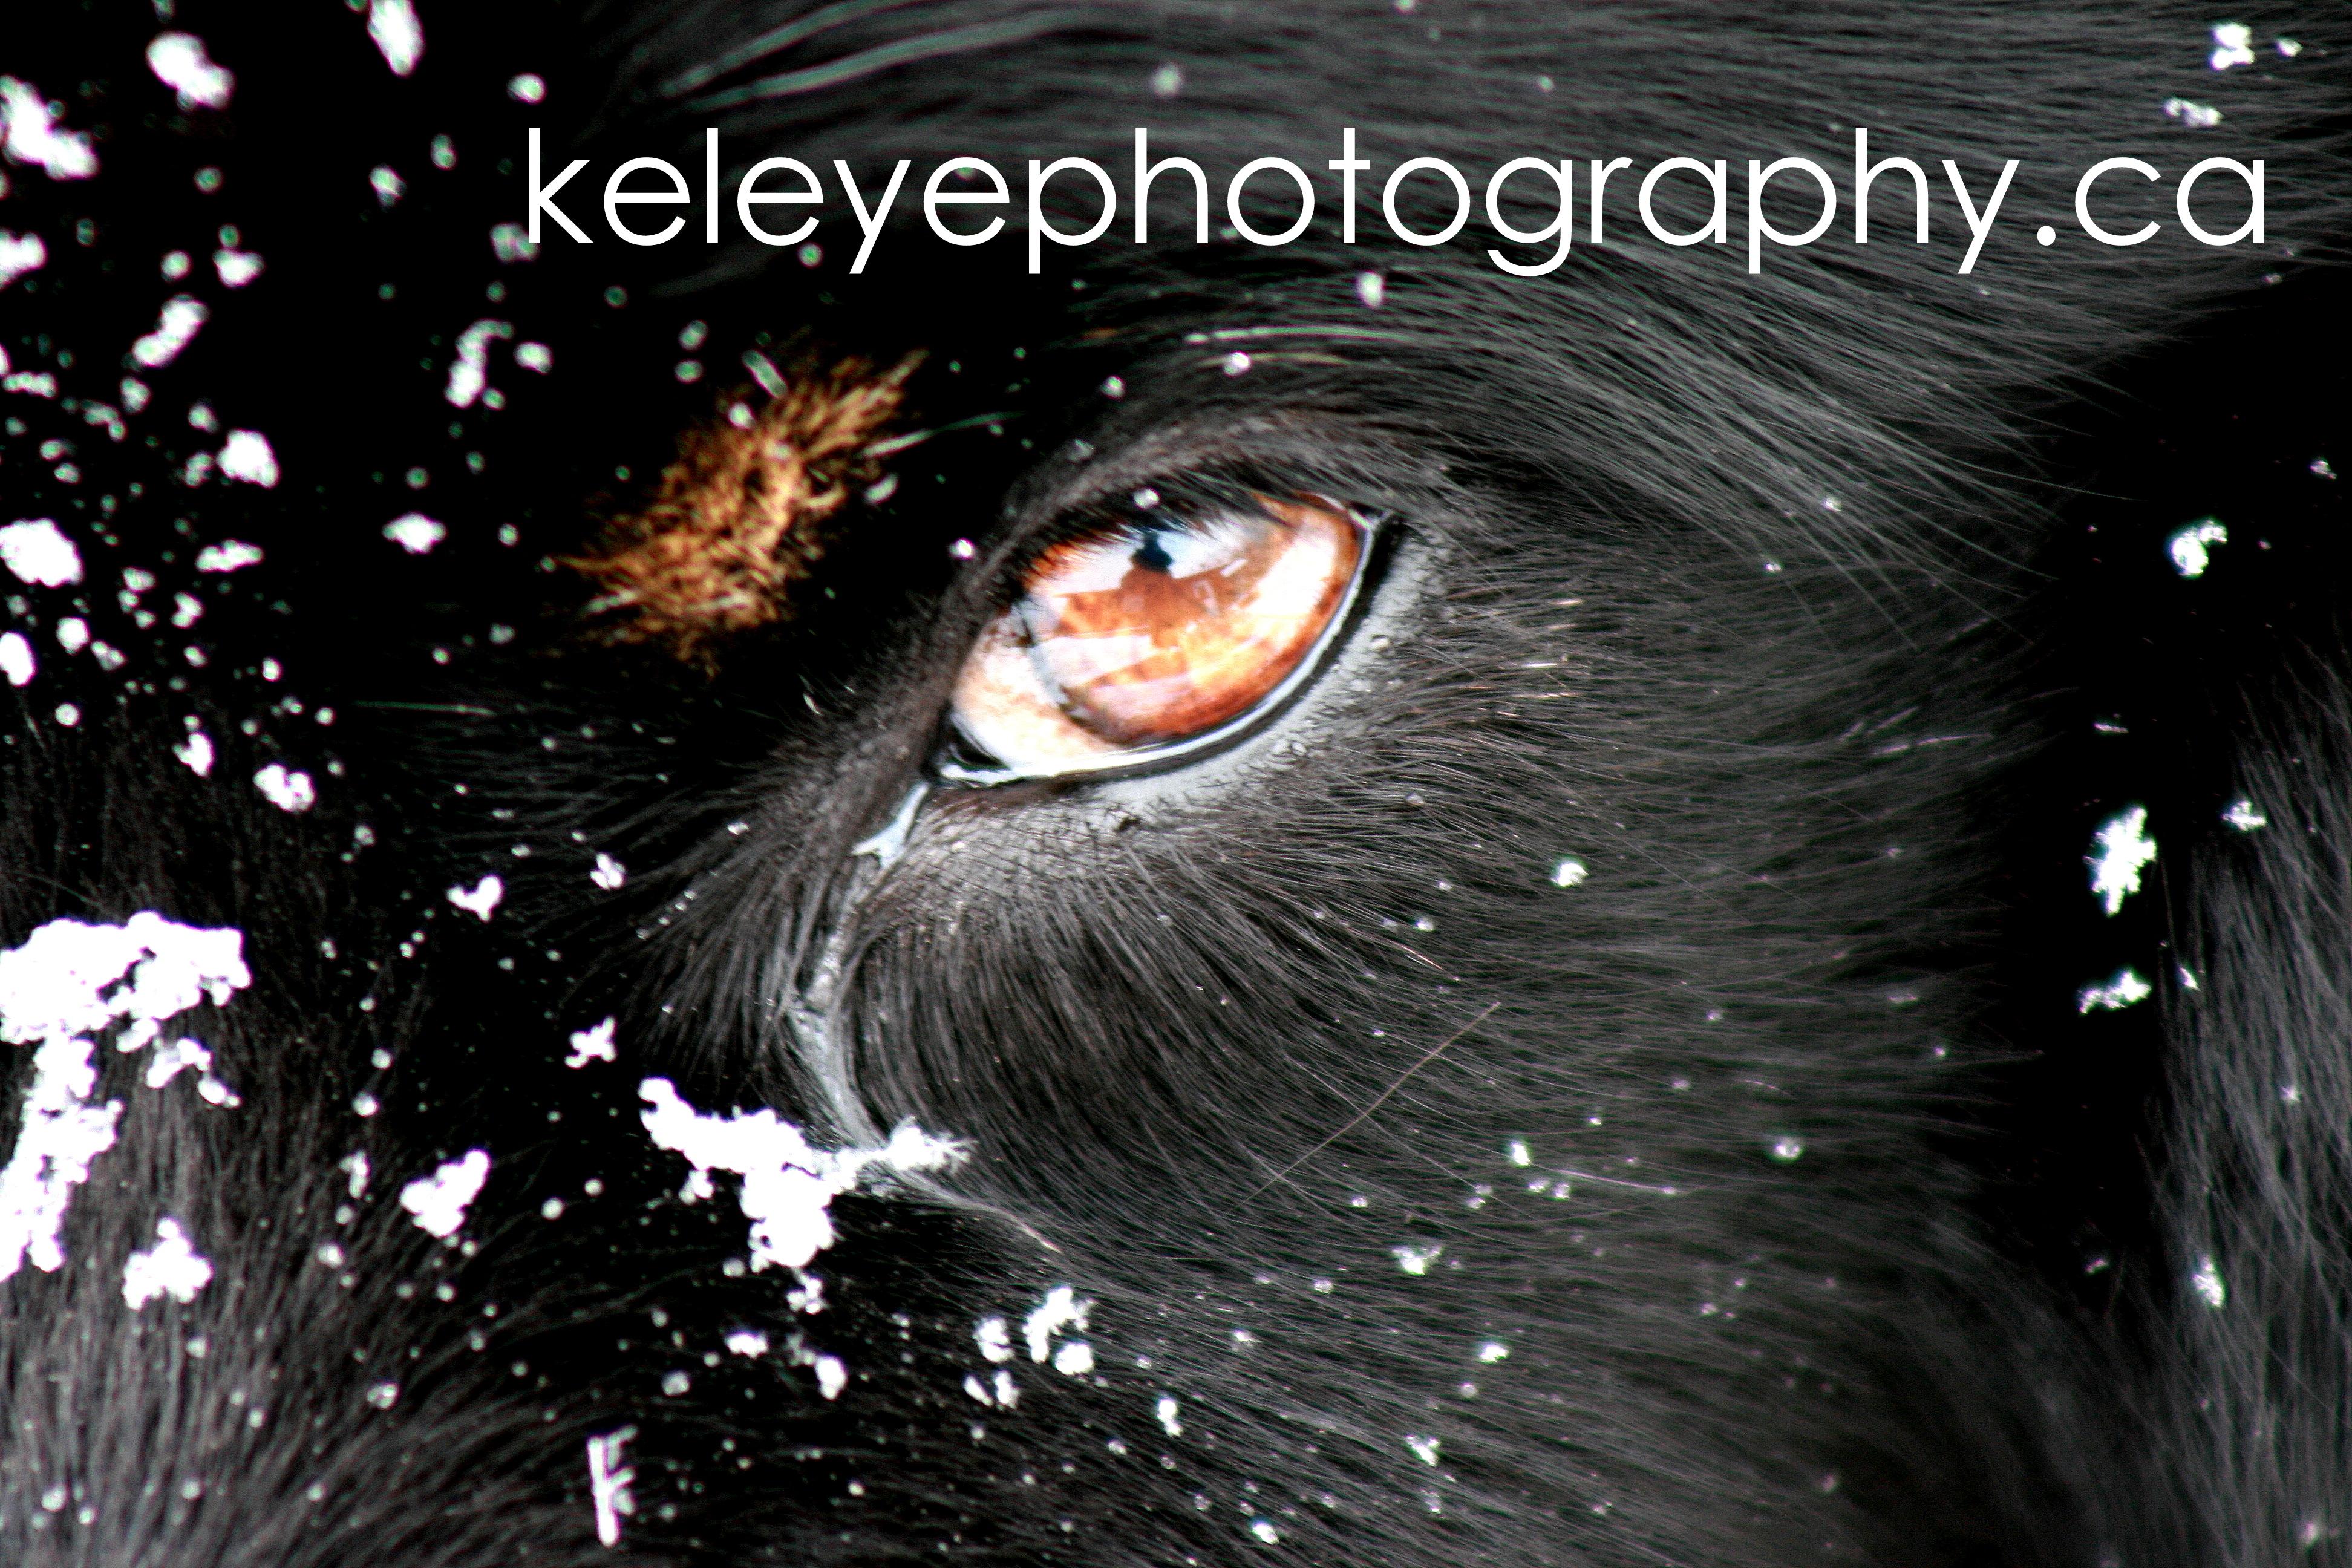 Kel Eye Photography